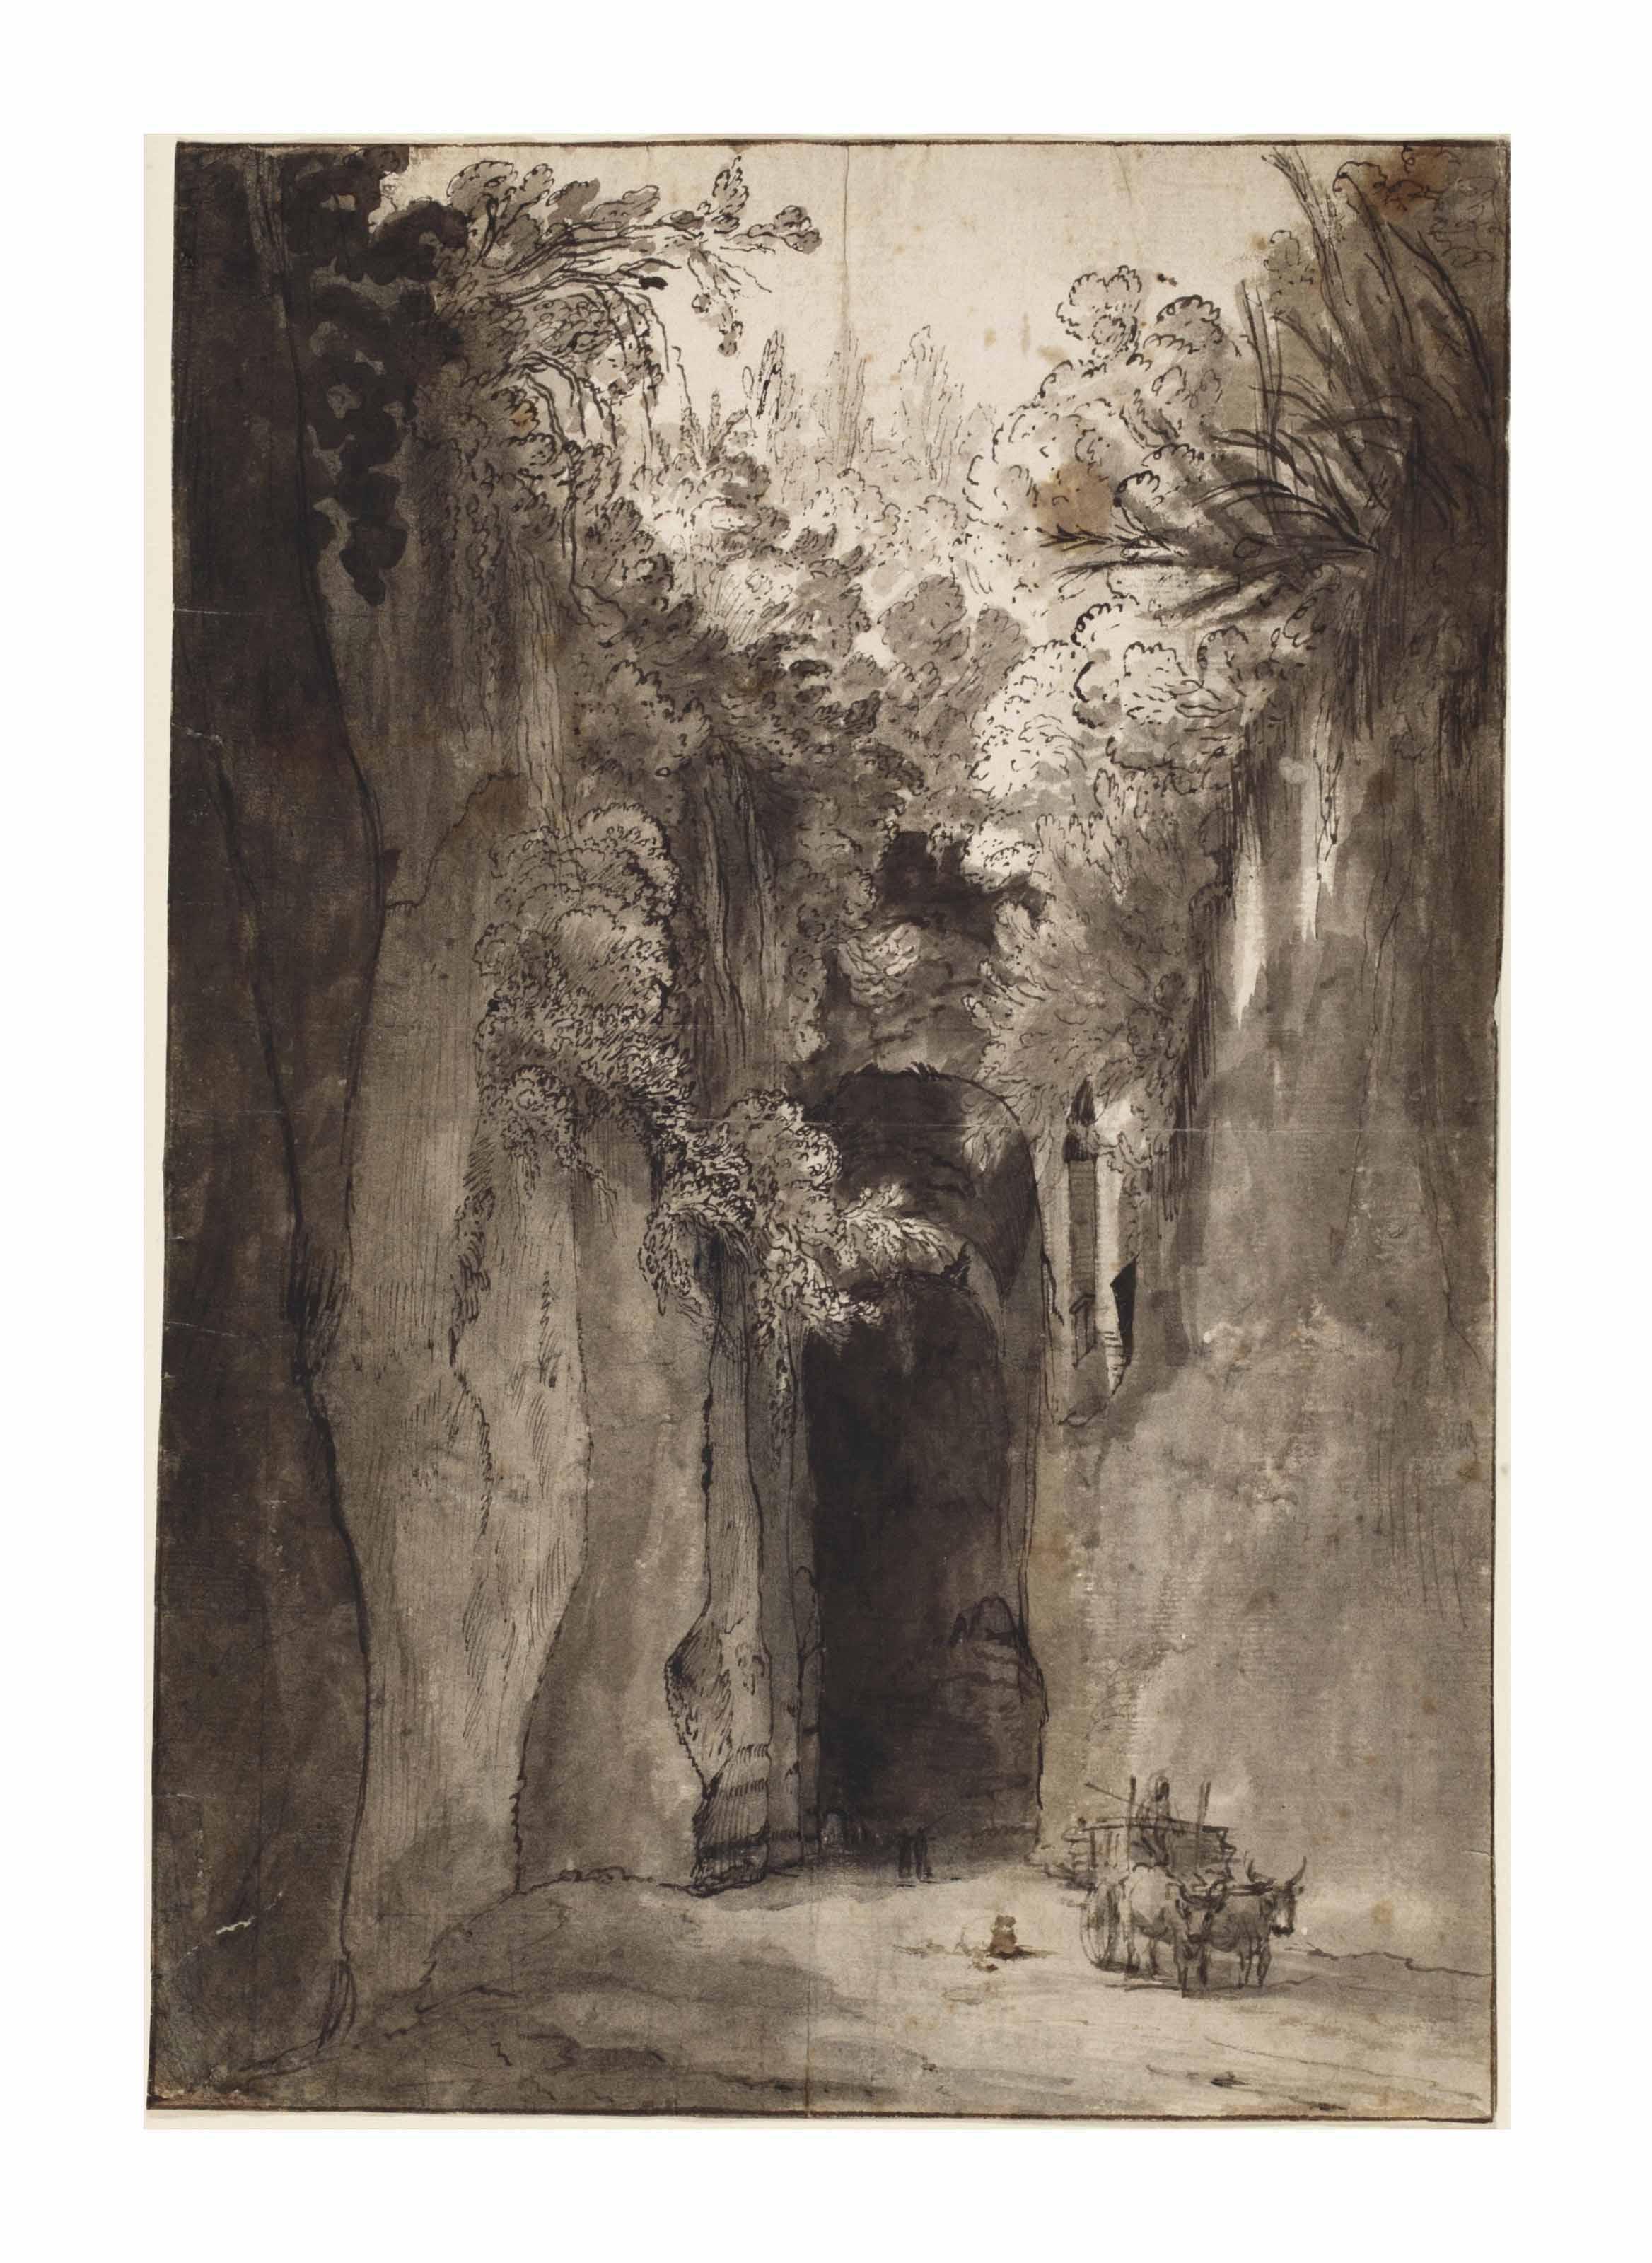 The Grotto of Virgil near Posillipo